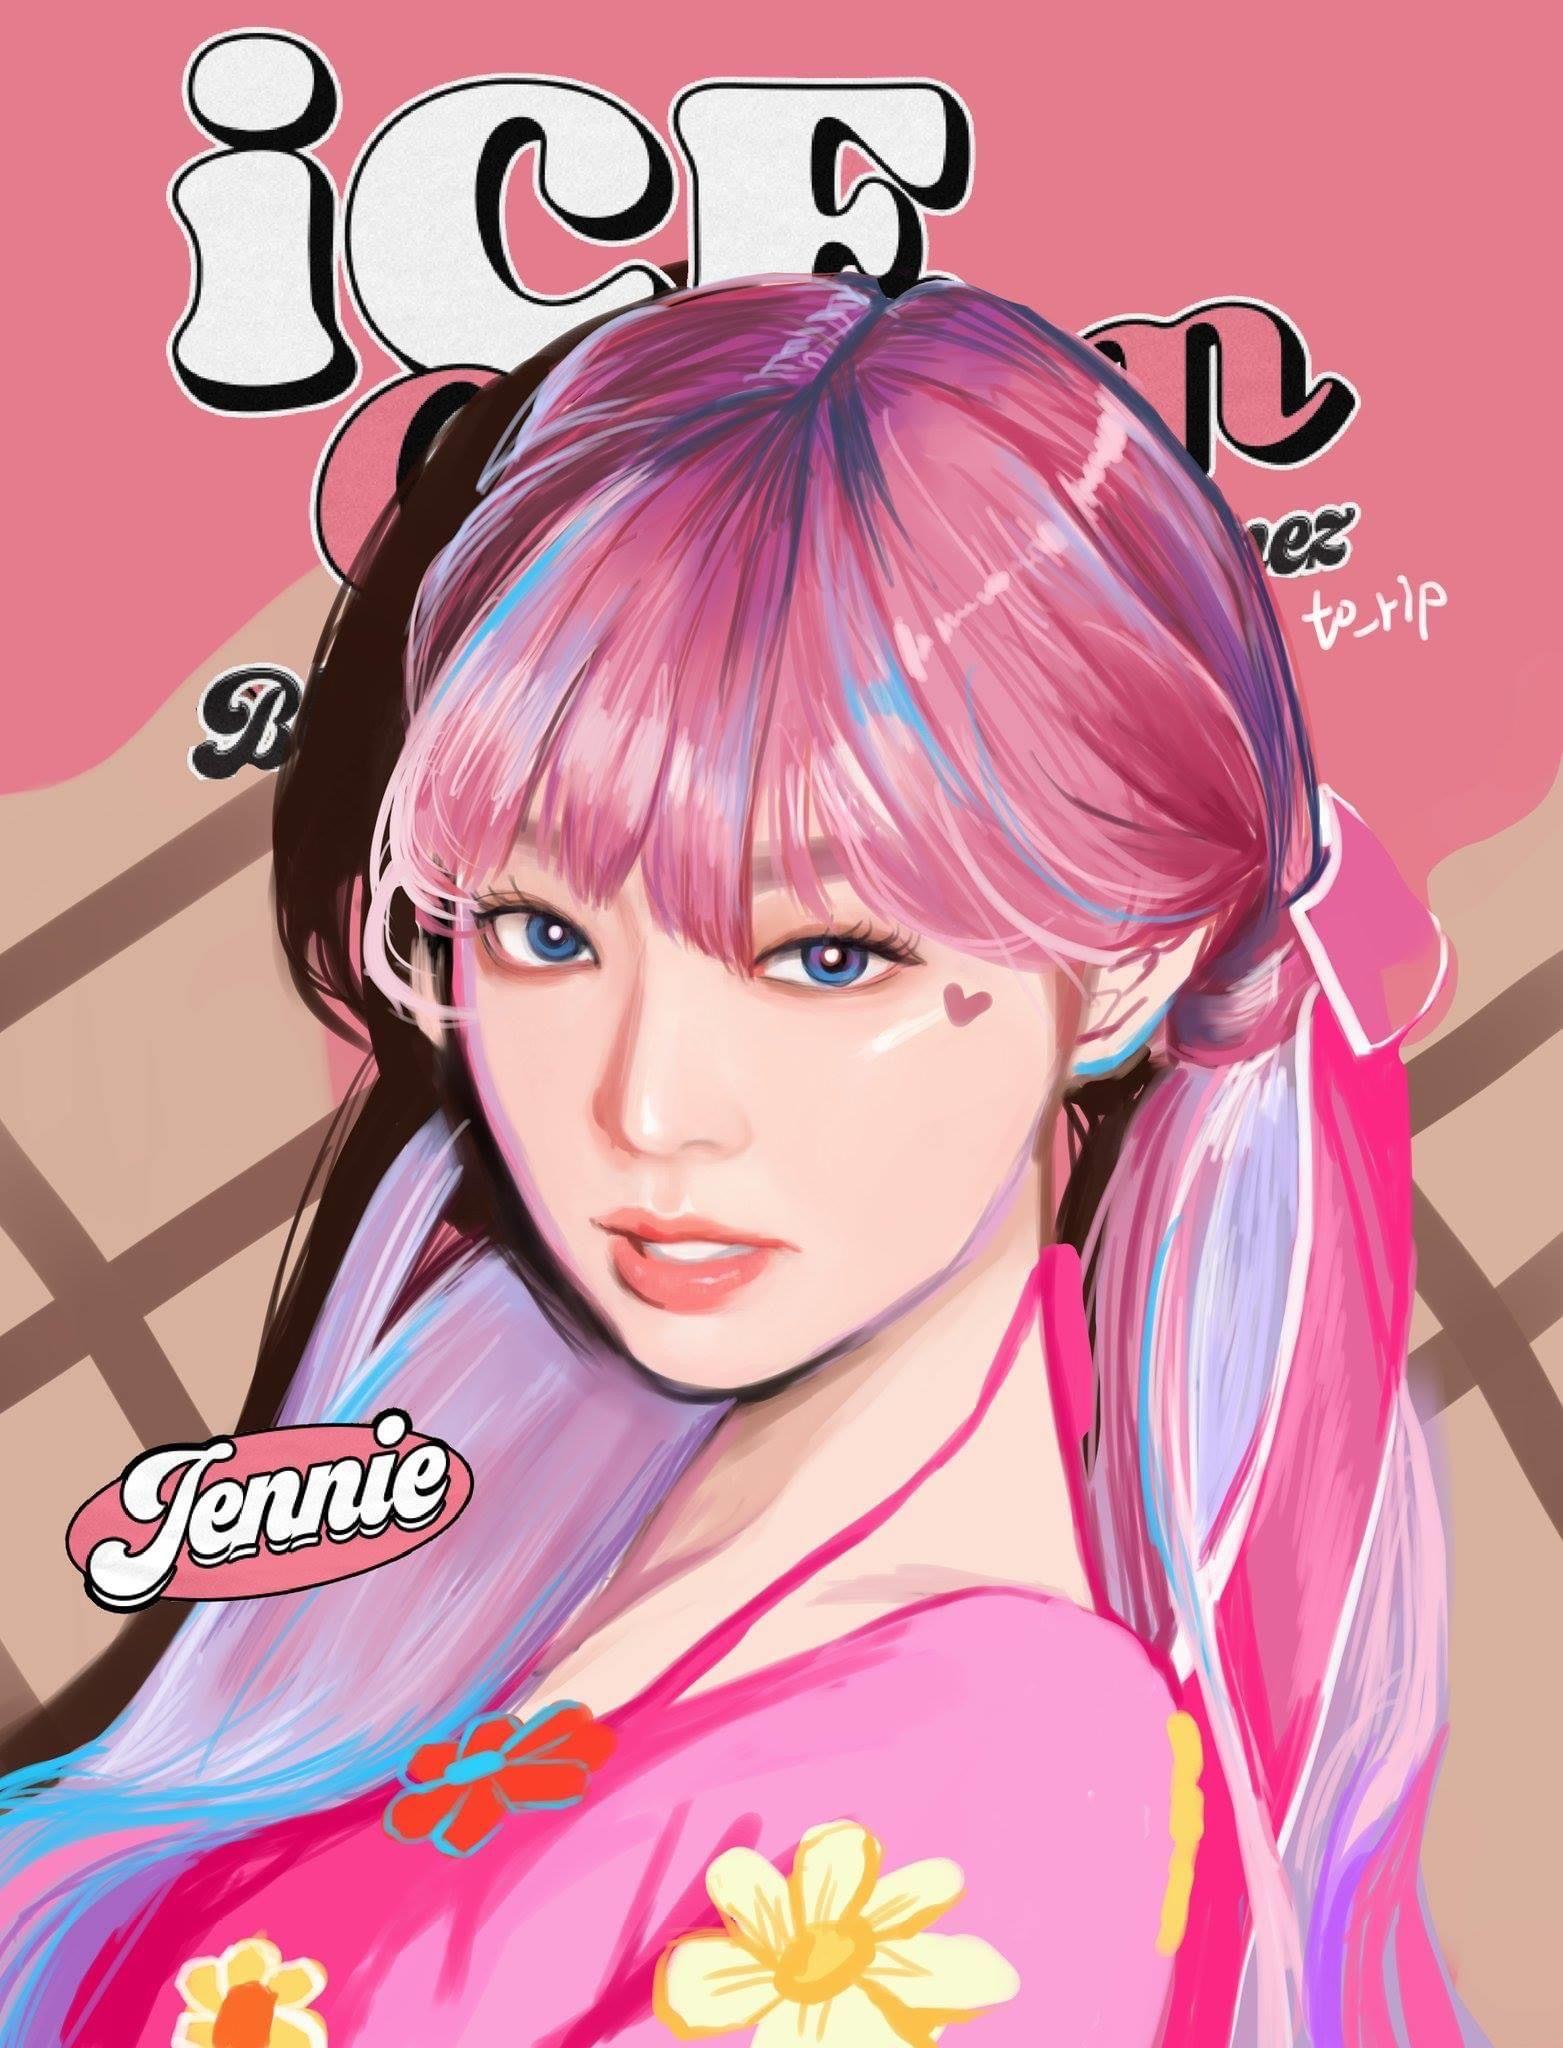 JENNIE Fanart in 2020 Blackpink jennie, Black pink kpop